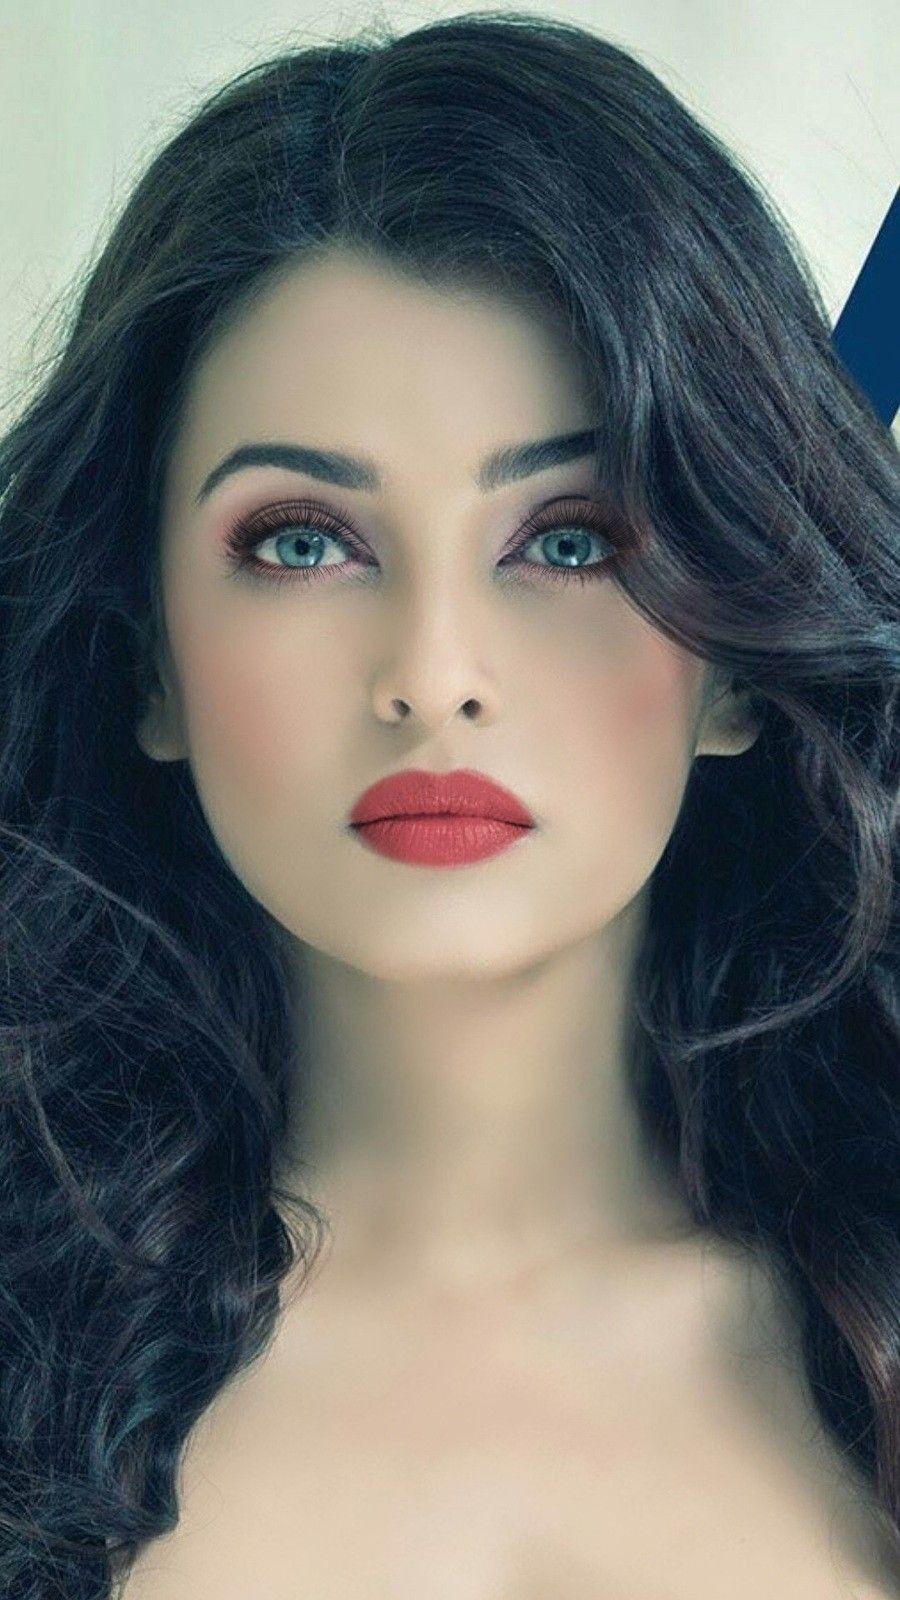 Aishwarya Rai Most Beautiful Star Porn  Wwwfreee-Pornscom-2046